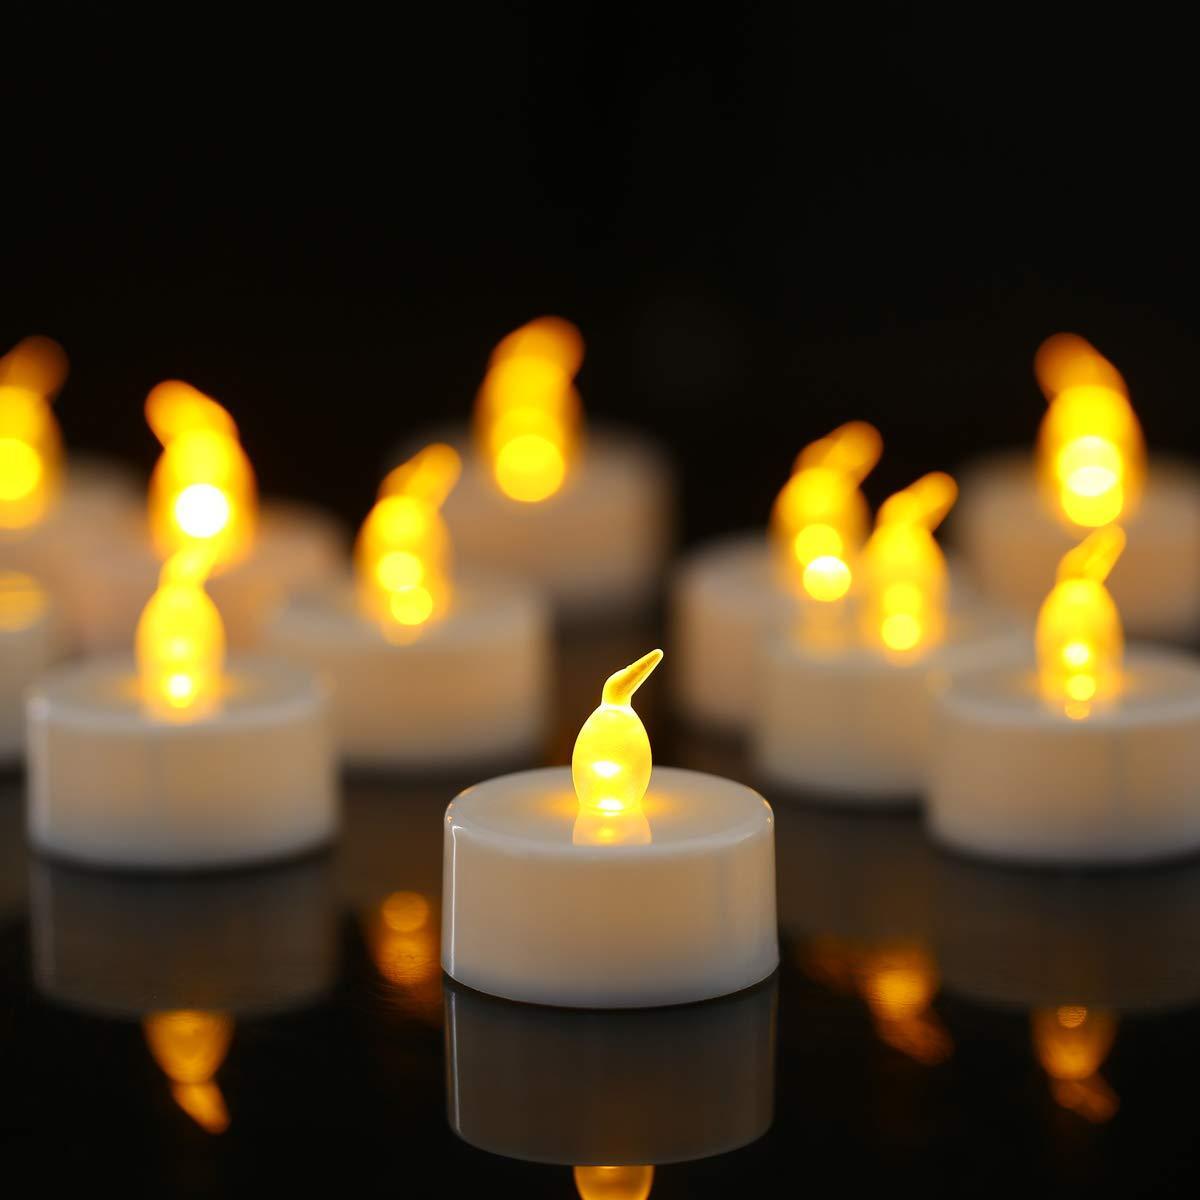 Tea Lights, Flameless LED Tea Lights Candles, Battery Powere